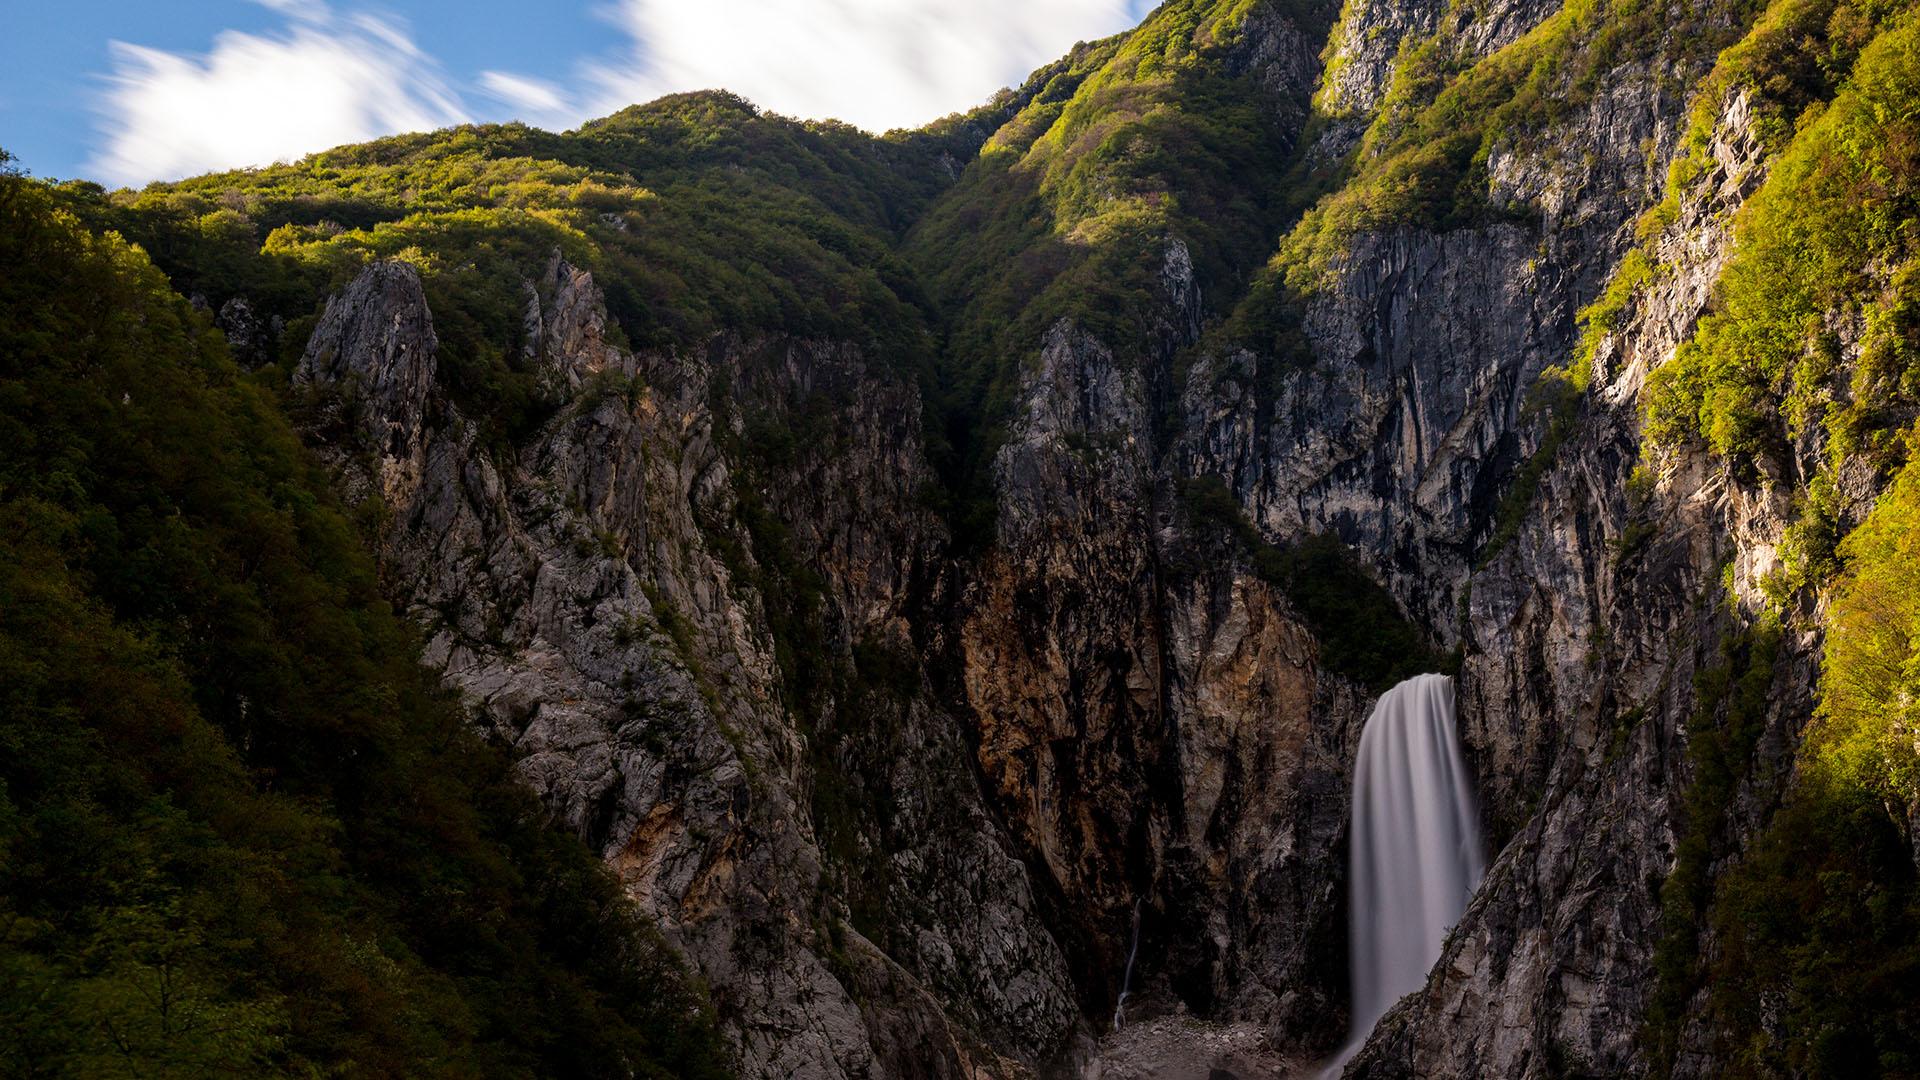 Boka Wasserfall